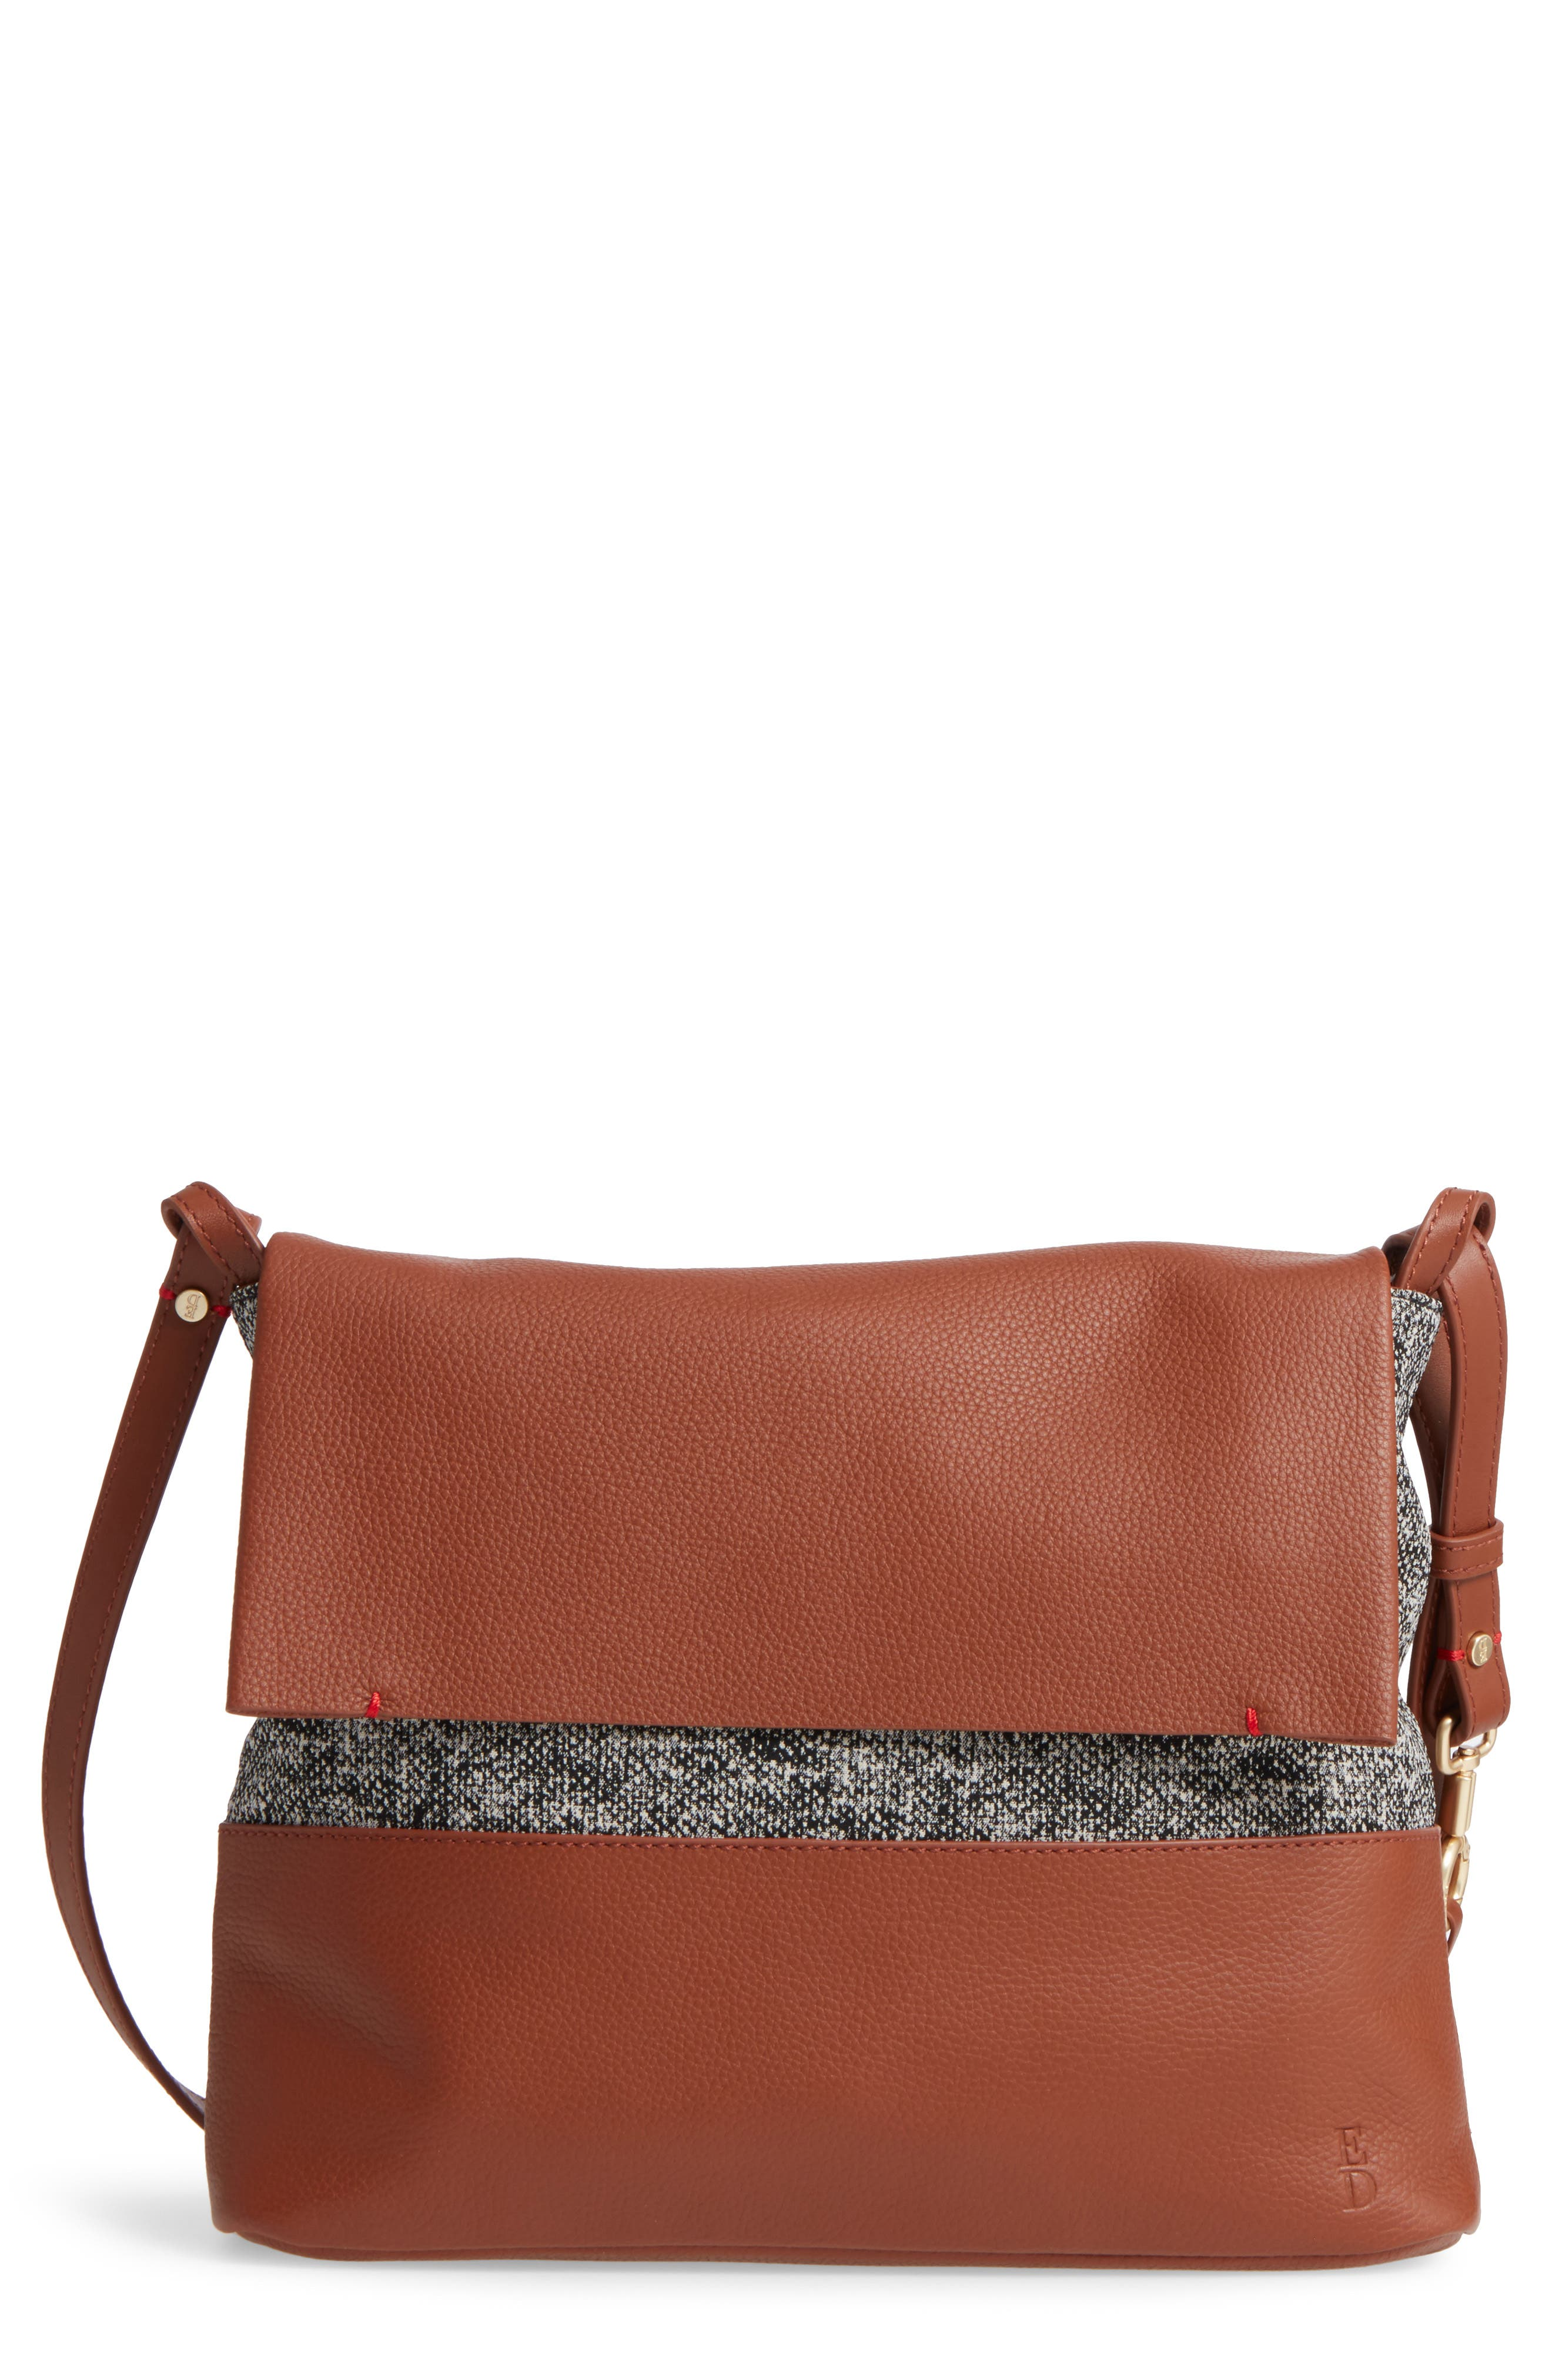 Medium Brea Crossbody Bag,                         Main,                         color, Whiskey